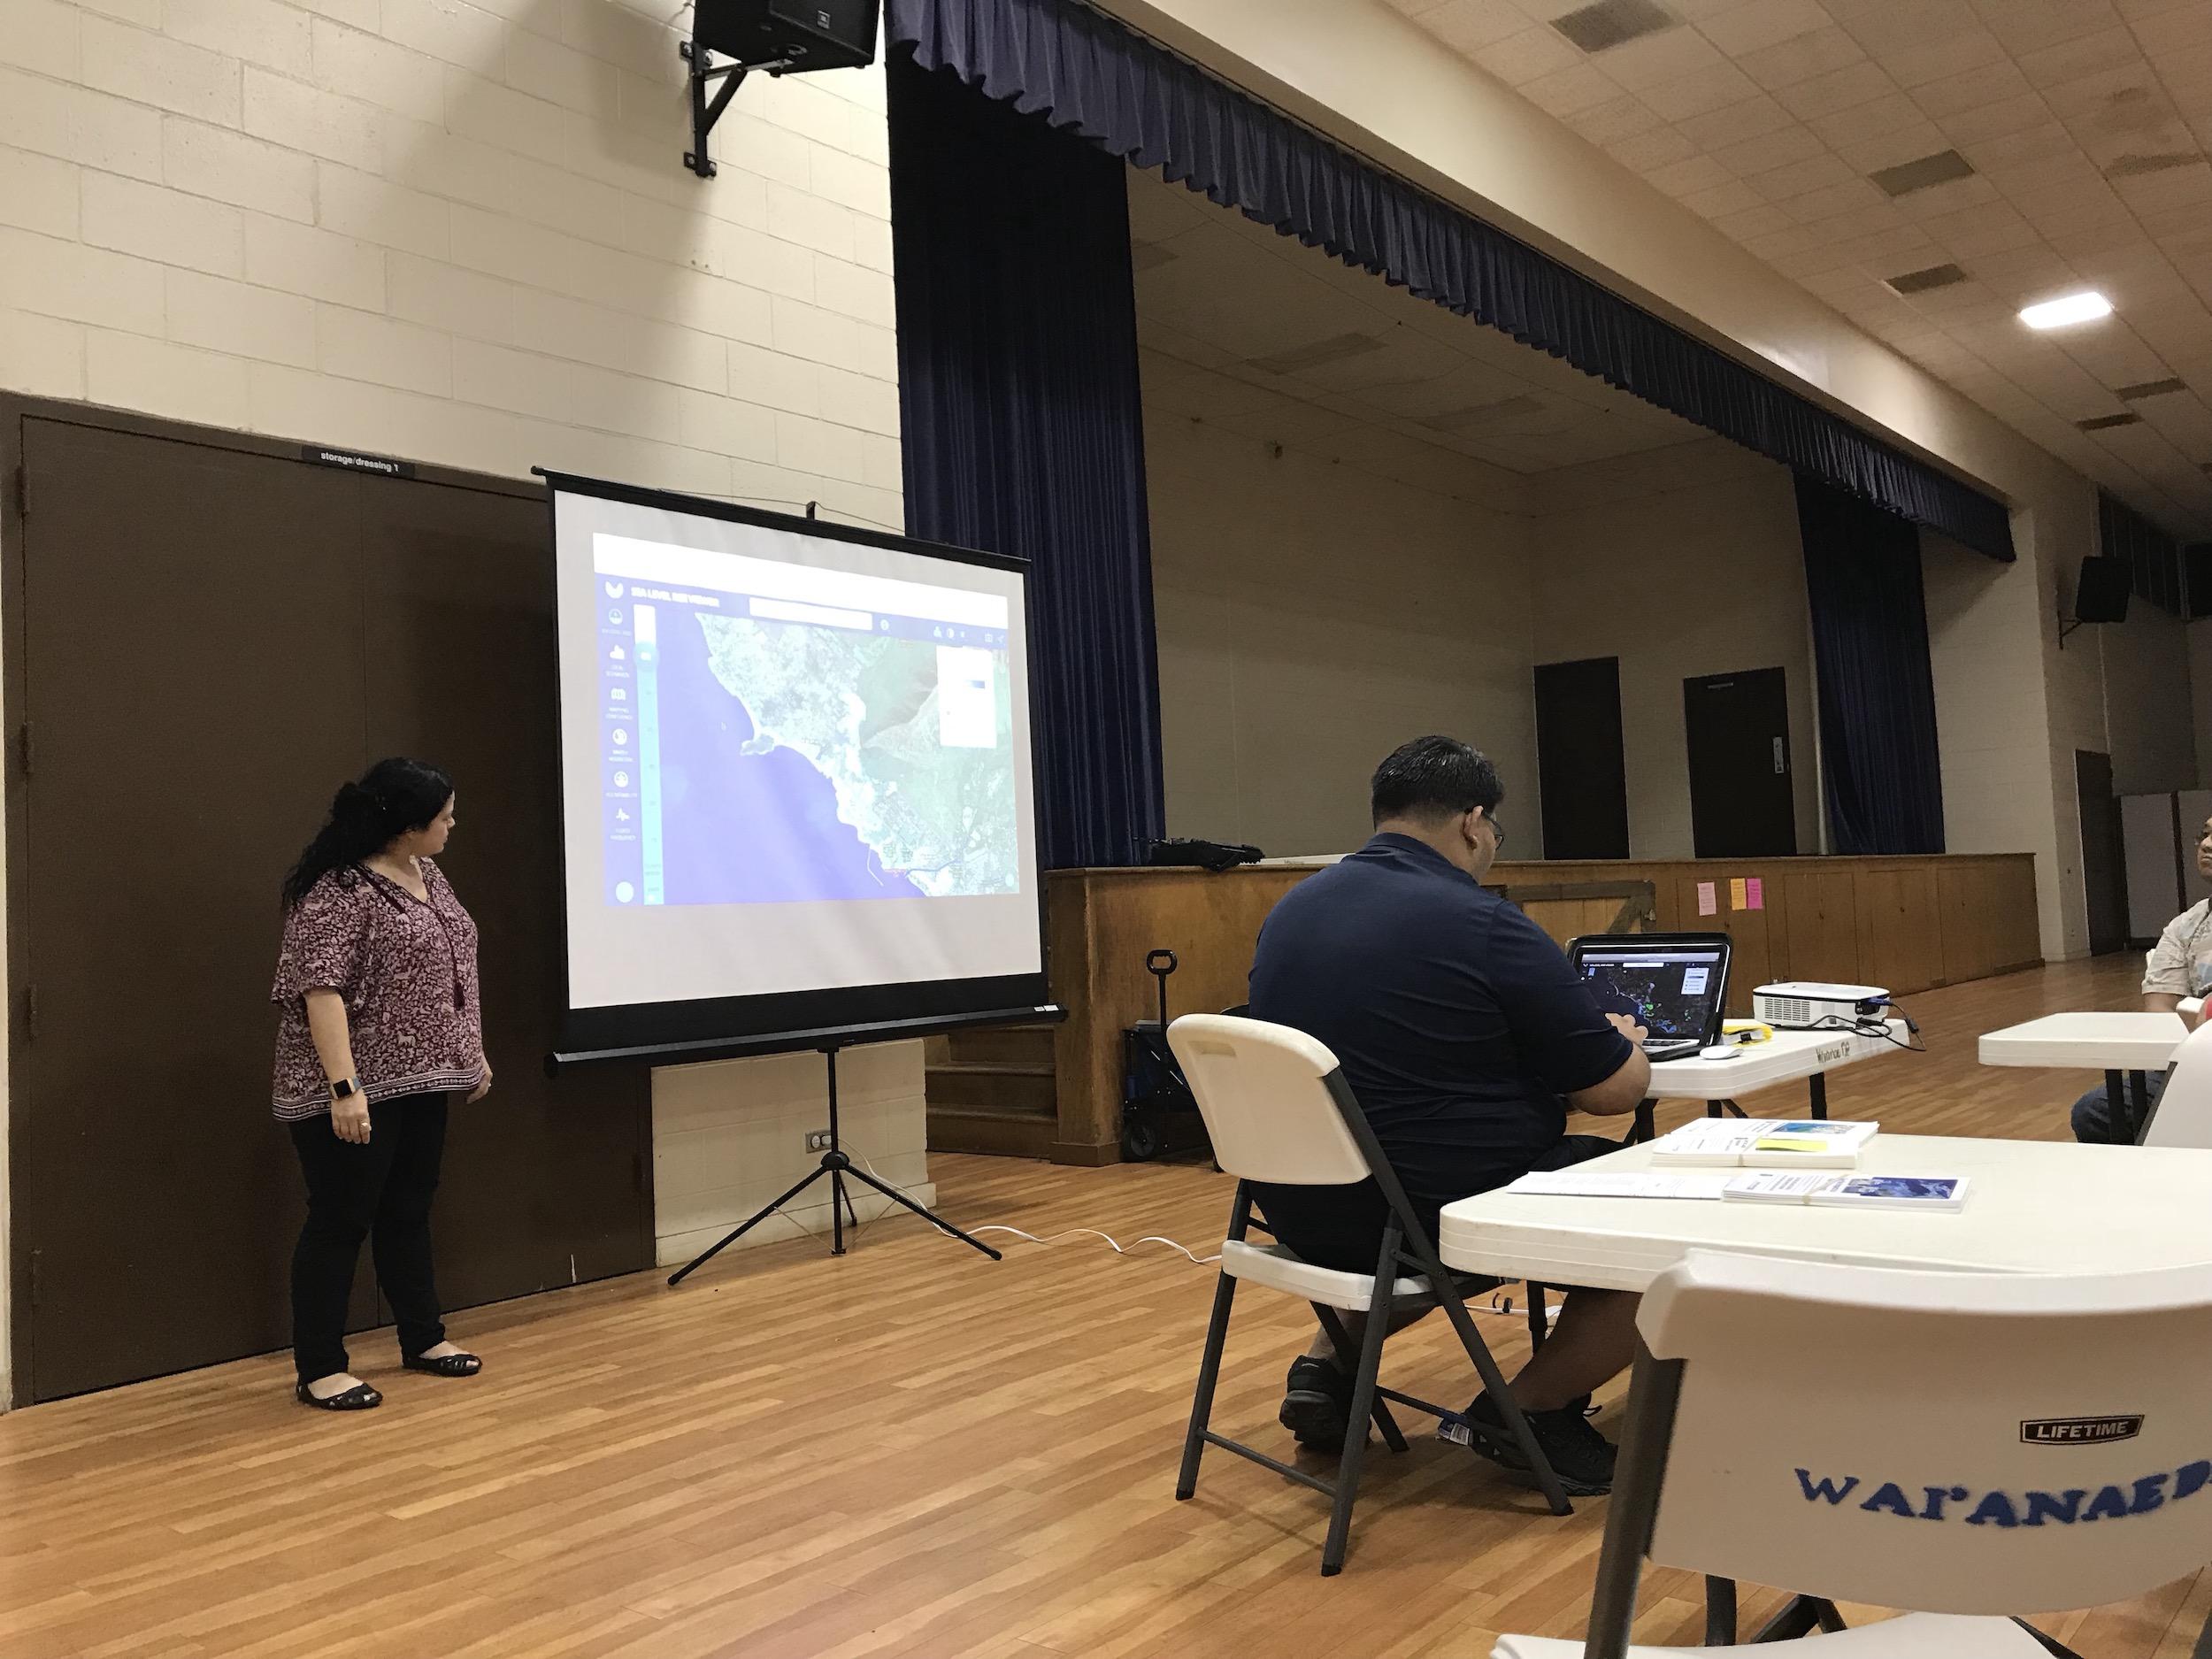 Sea level rise app demo from a speaker representing NOAA.